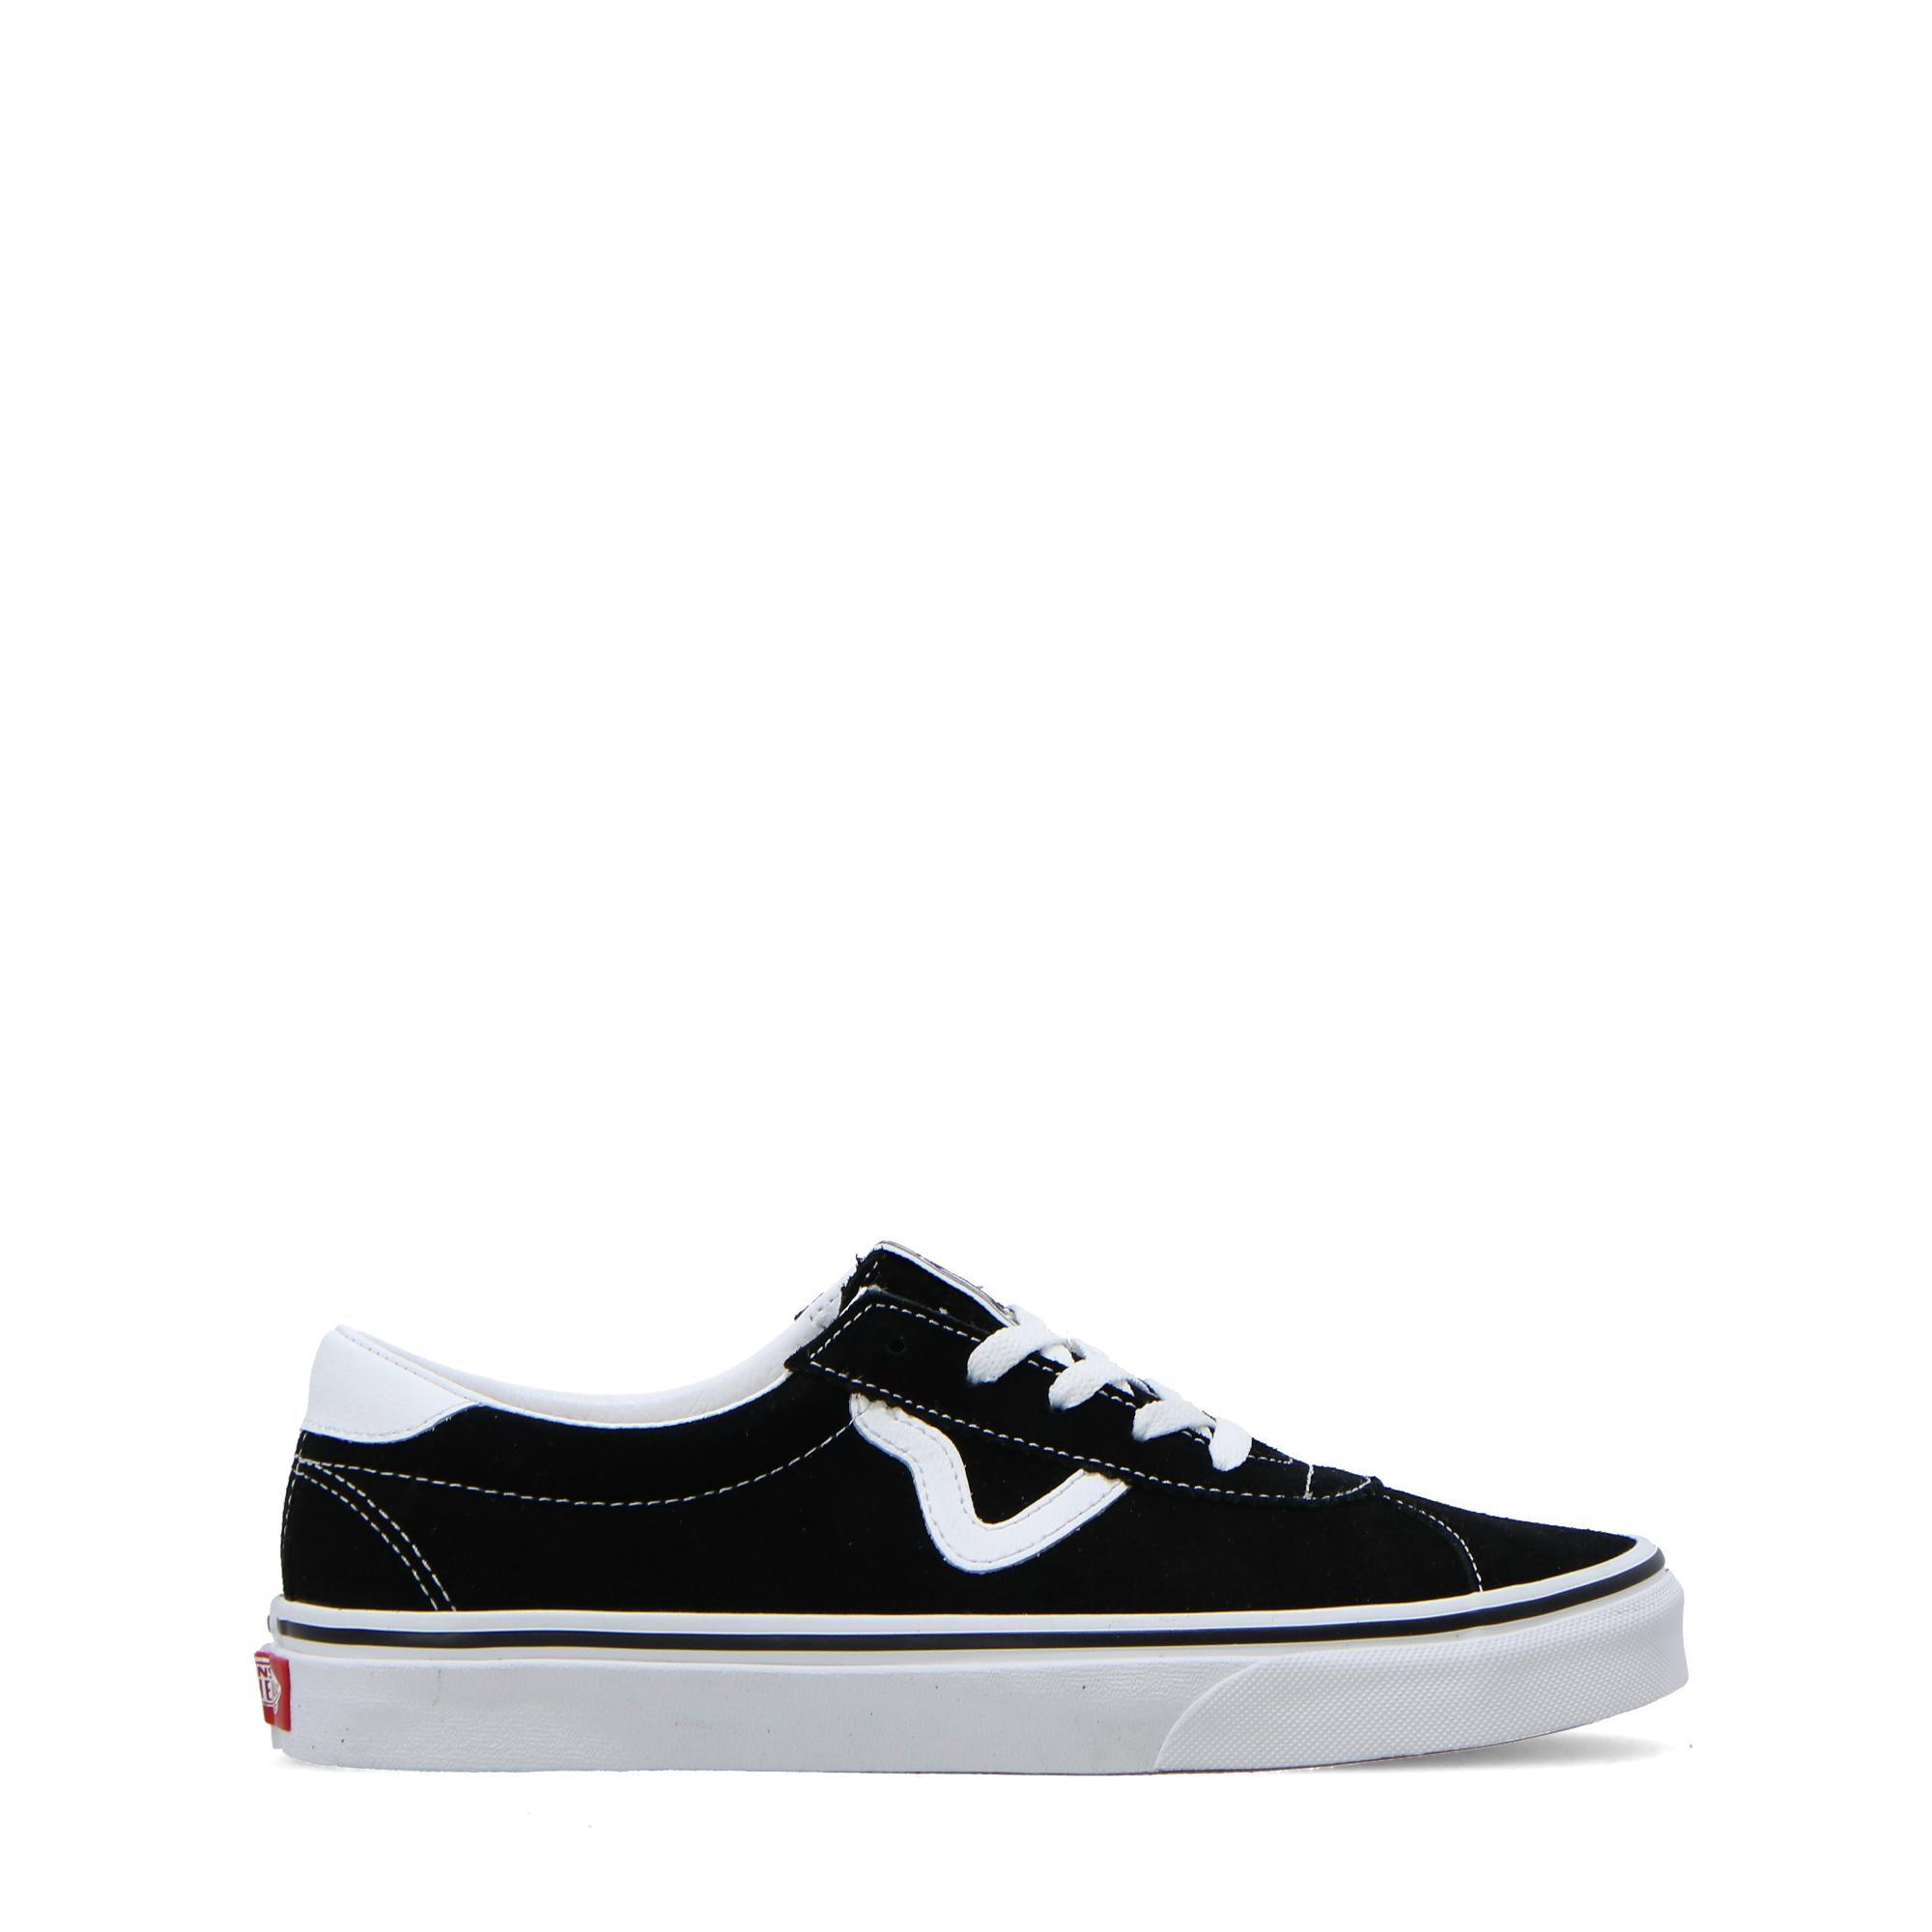 Vans Ua Vans Sport (suede) black